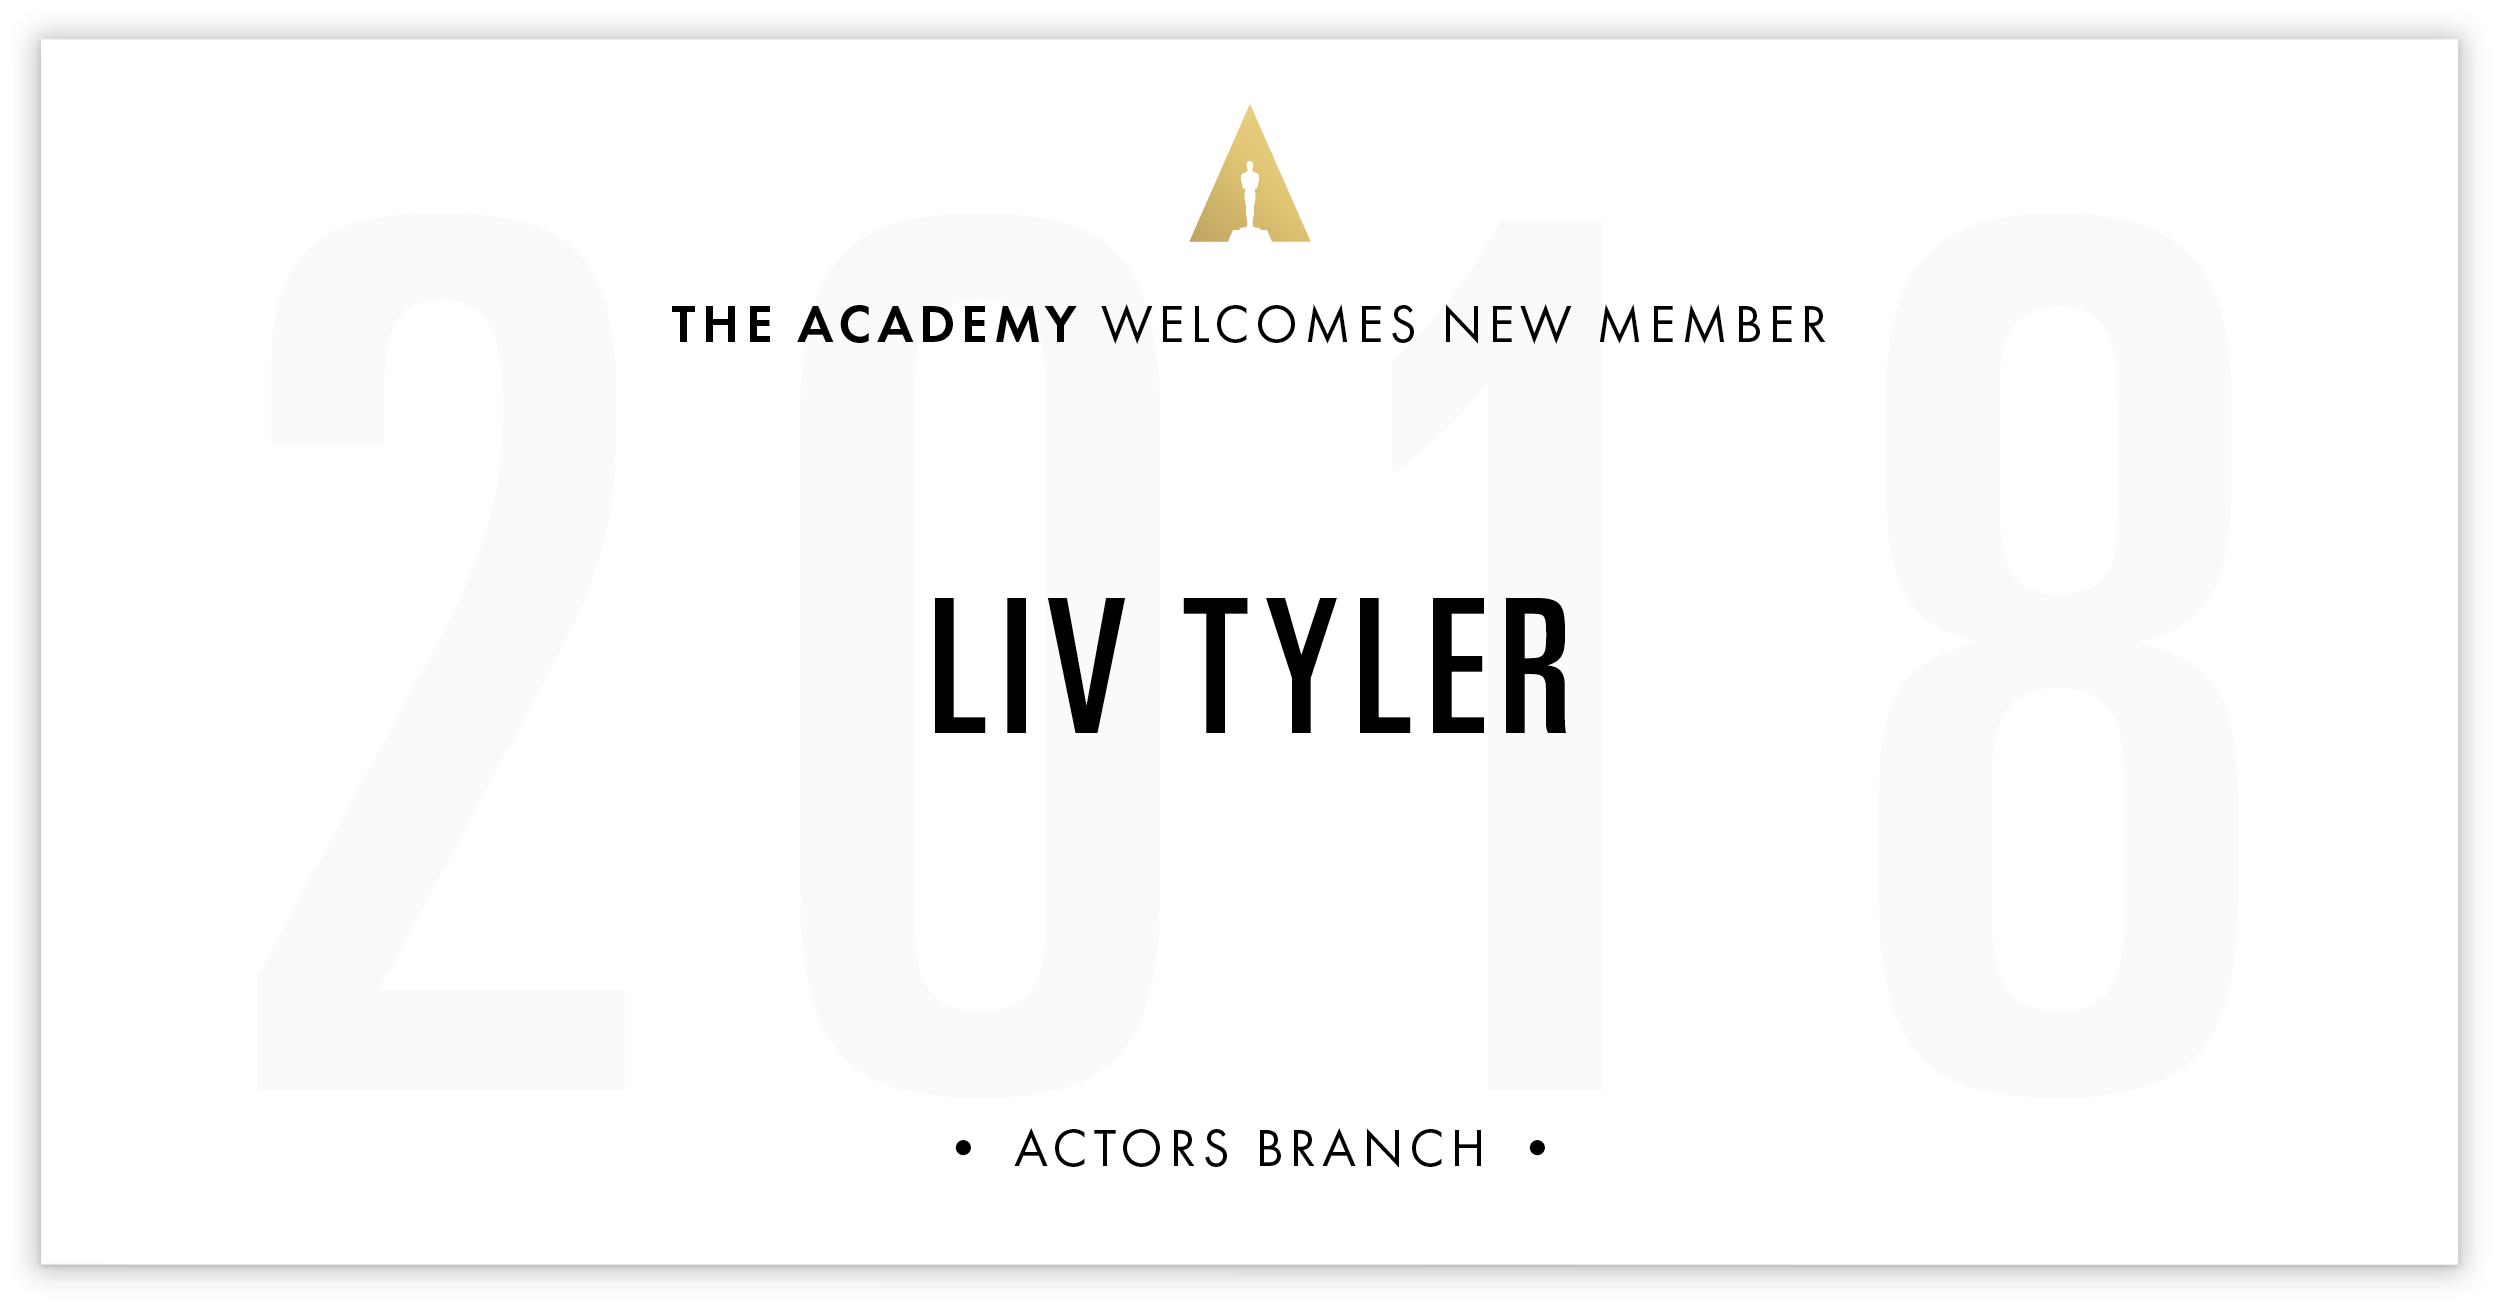 Liv Tyler is invited!